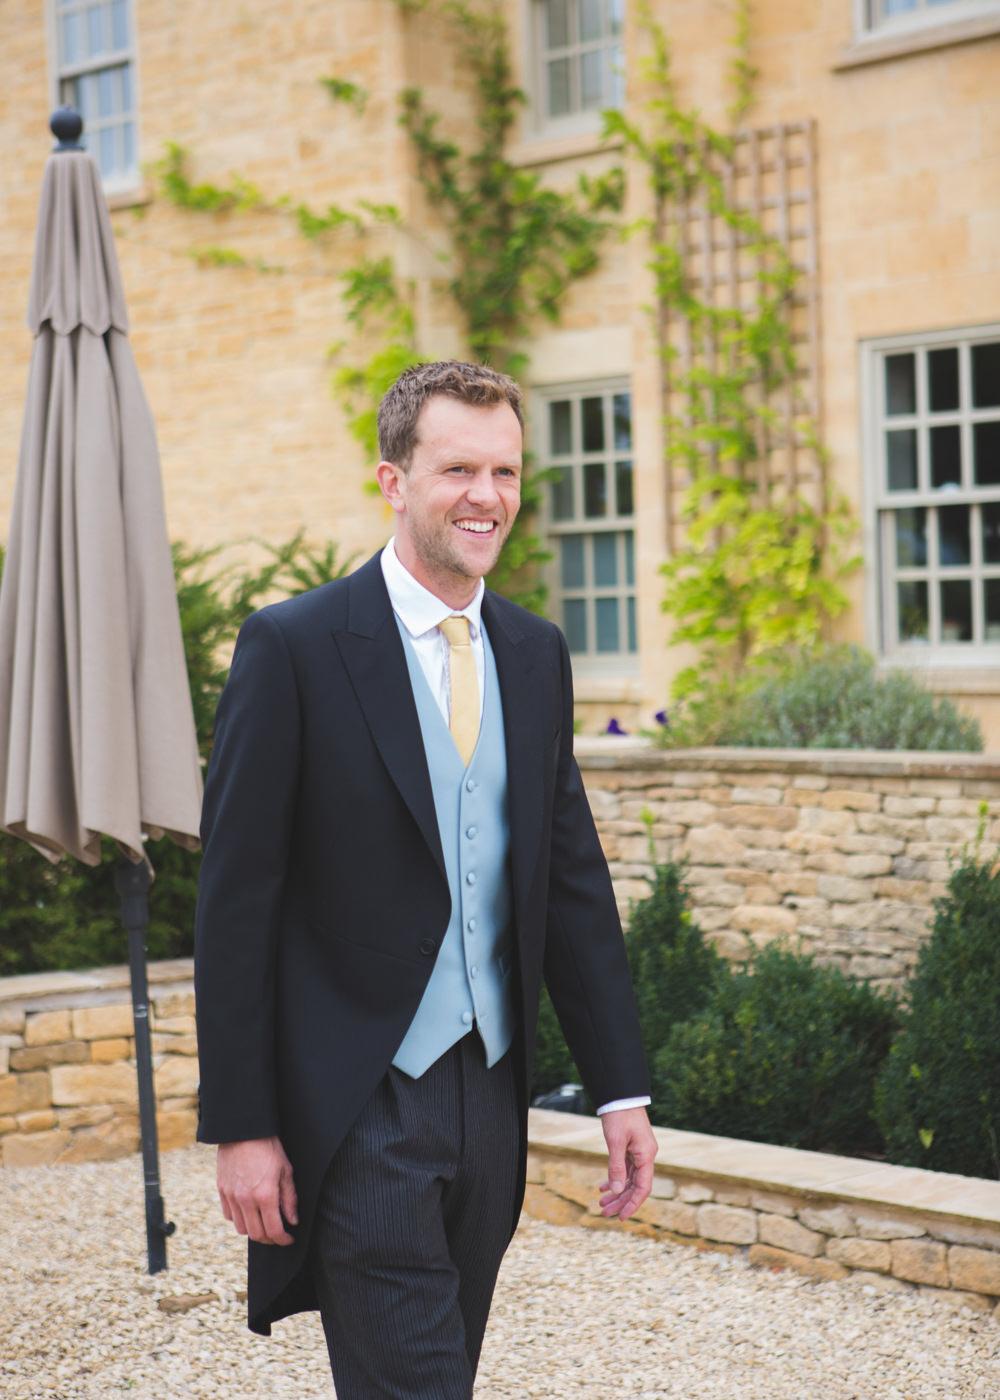 Groom Suit Traditional Tails Airbnb Wedding Pickavance Weddings